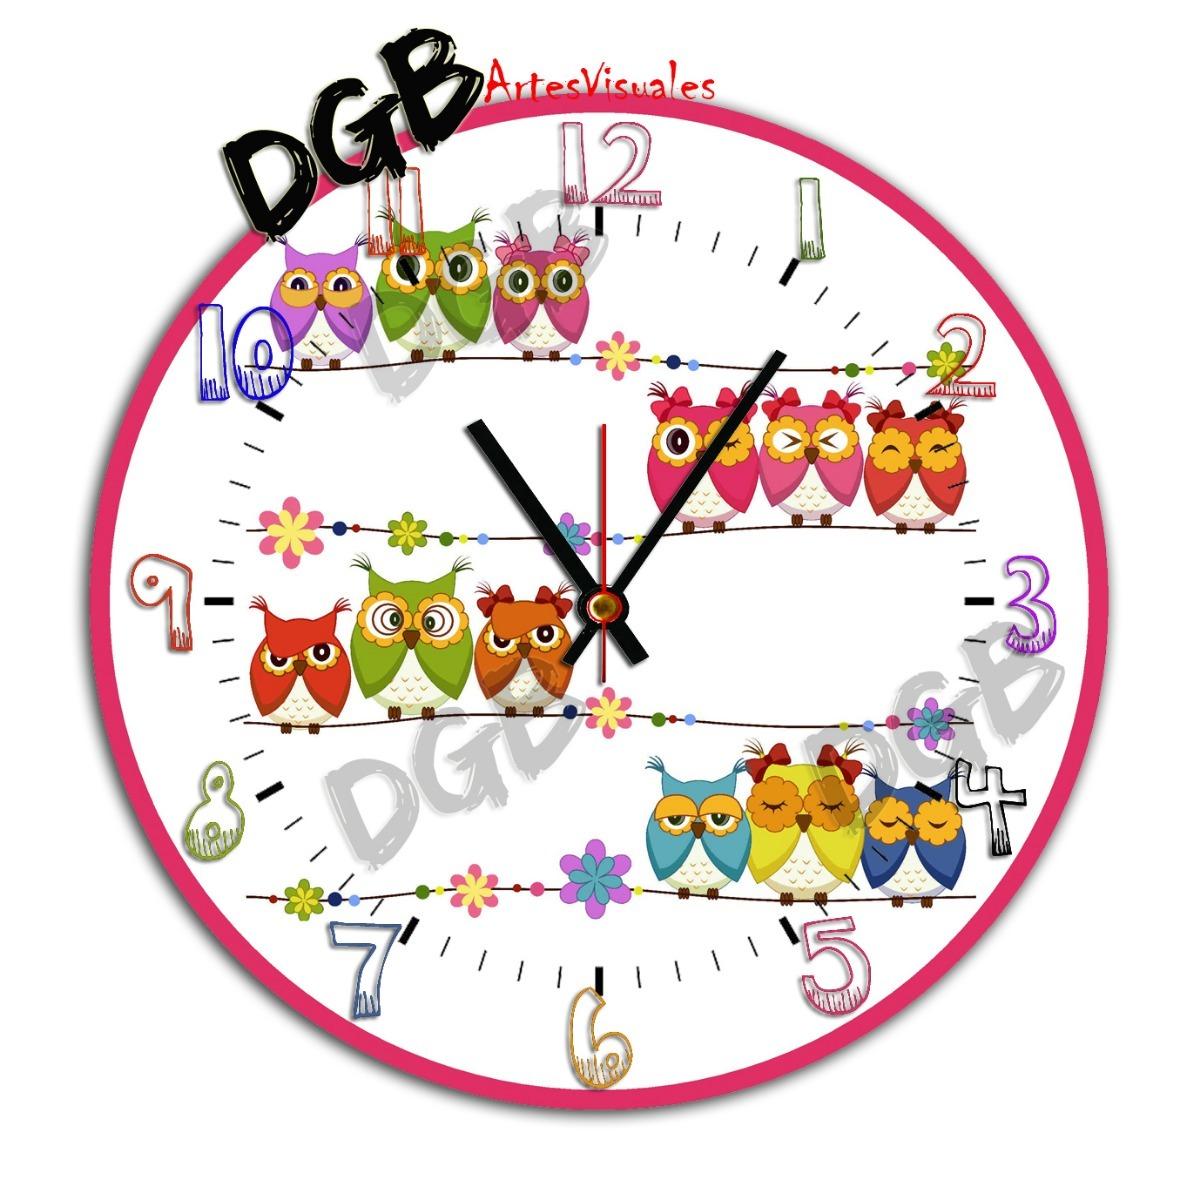 bf6af7ab7d92 Reloj De Pared Infantil Decoracion 30 Cm Unicos!!! -   319